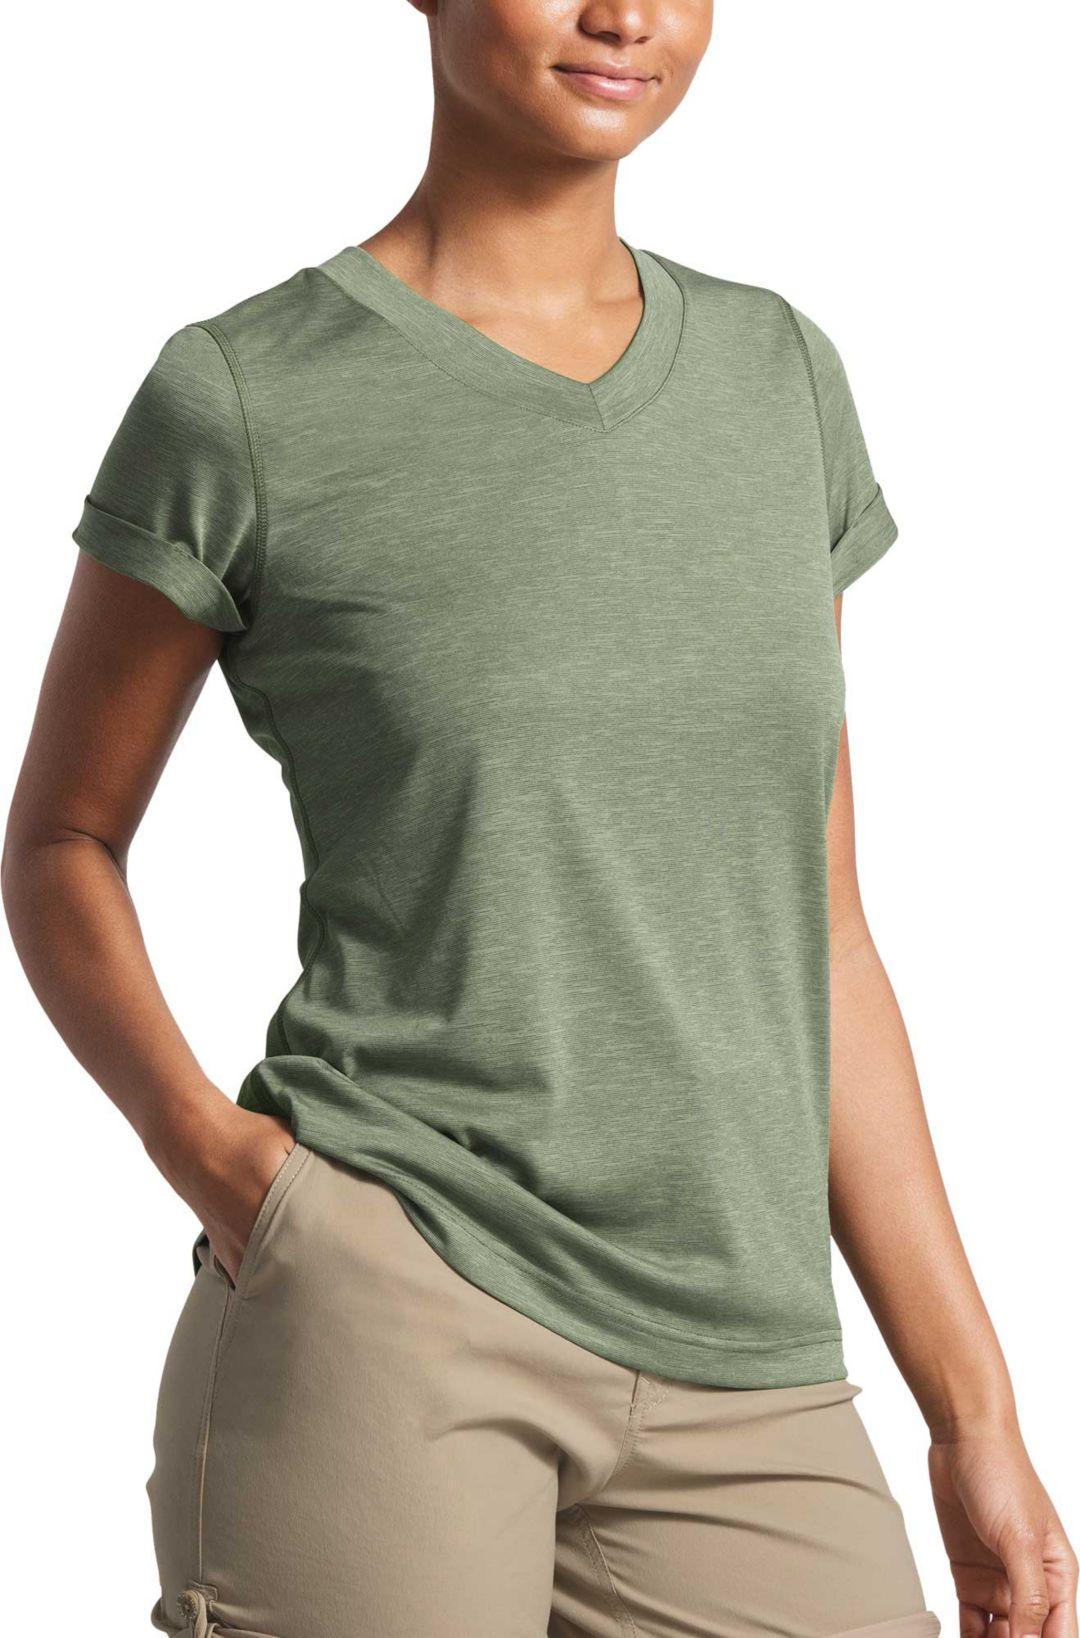 6ecf62c9e The North Face Women's HyperLayer FlashDry V-Neck T-Shirt